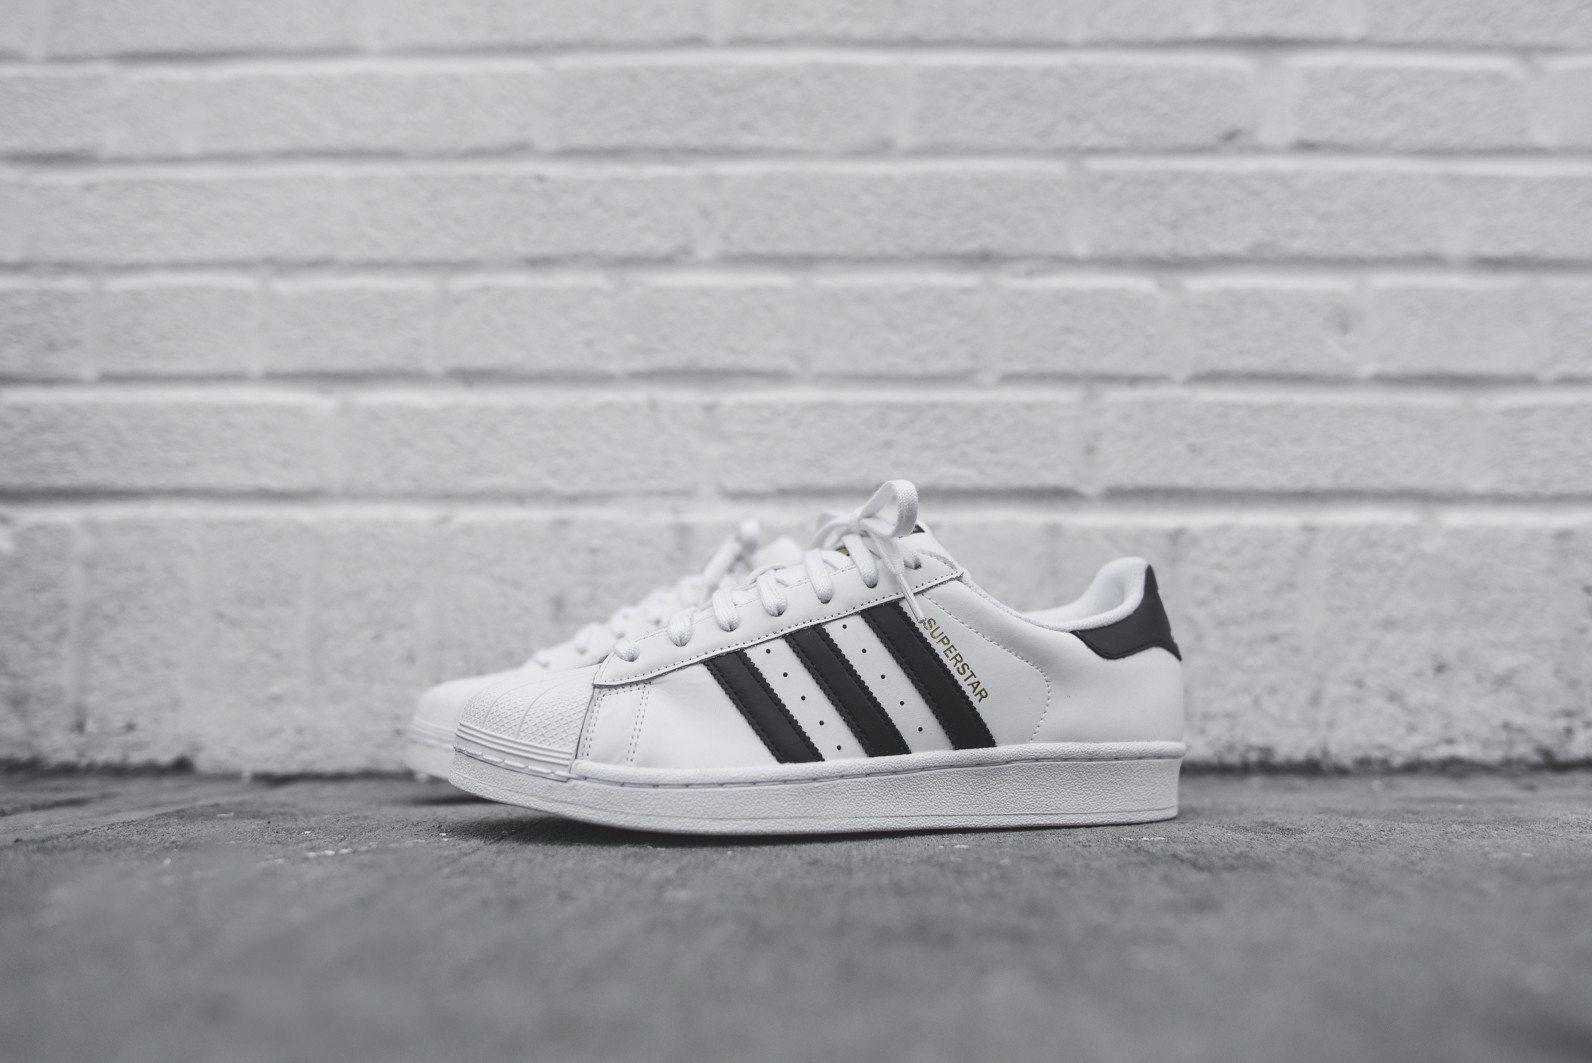 adidas Originals Superstar White Black 2